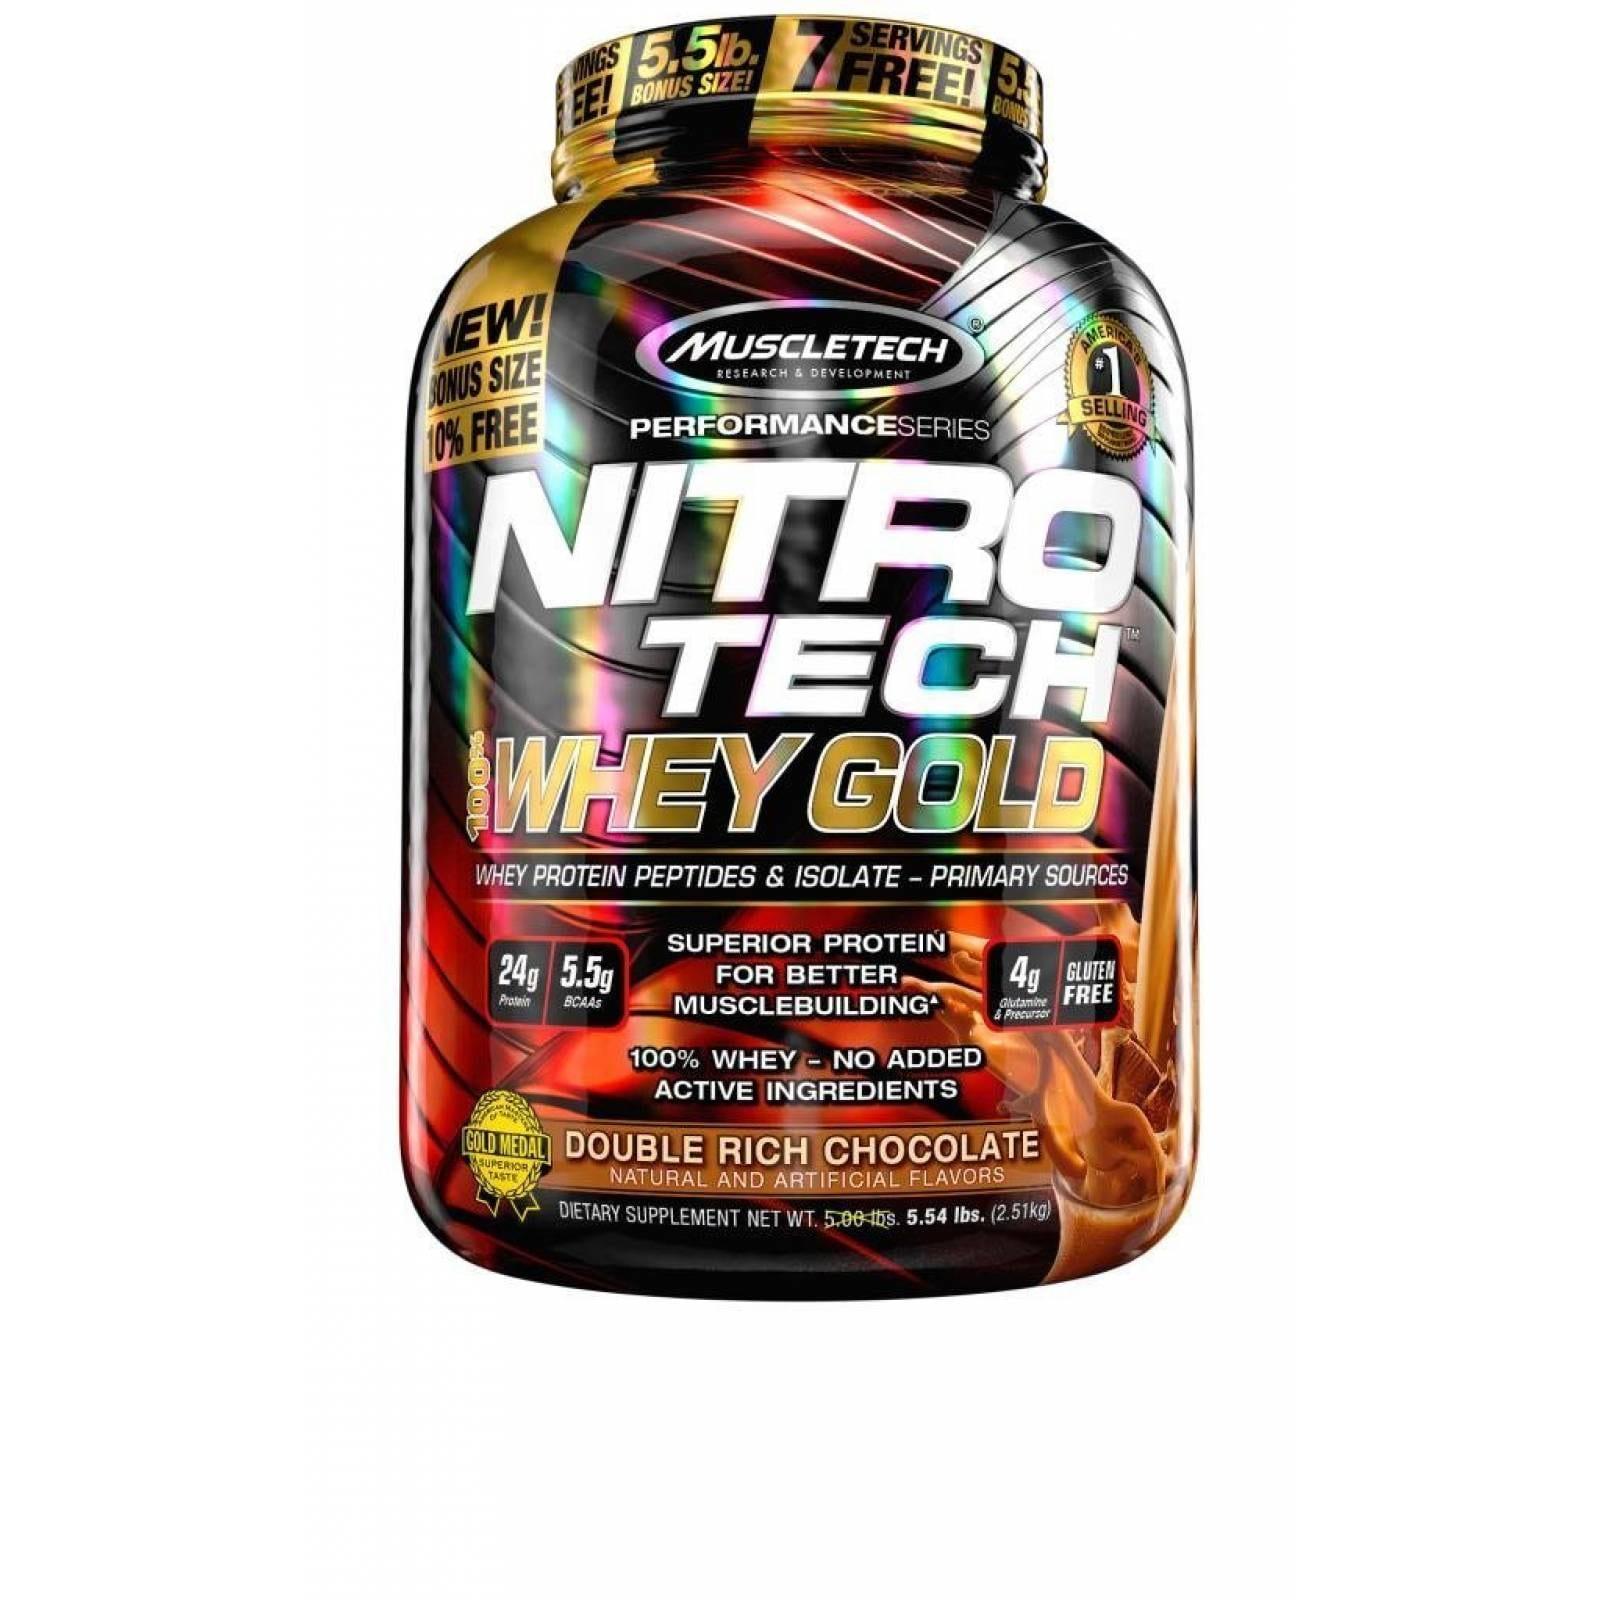 MT NITRO-TECH WHEY GOLD 5.53 LBS DOUBLE RICH CHOCOLATE